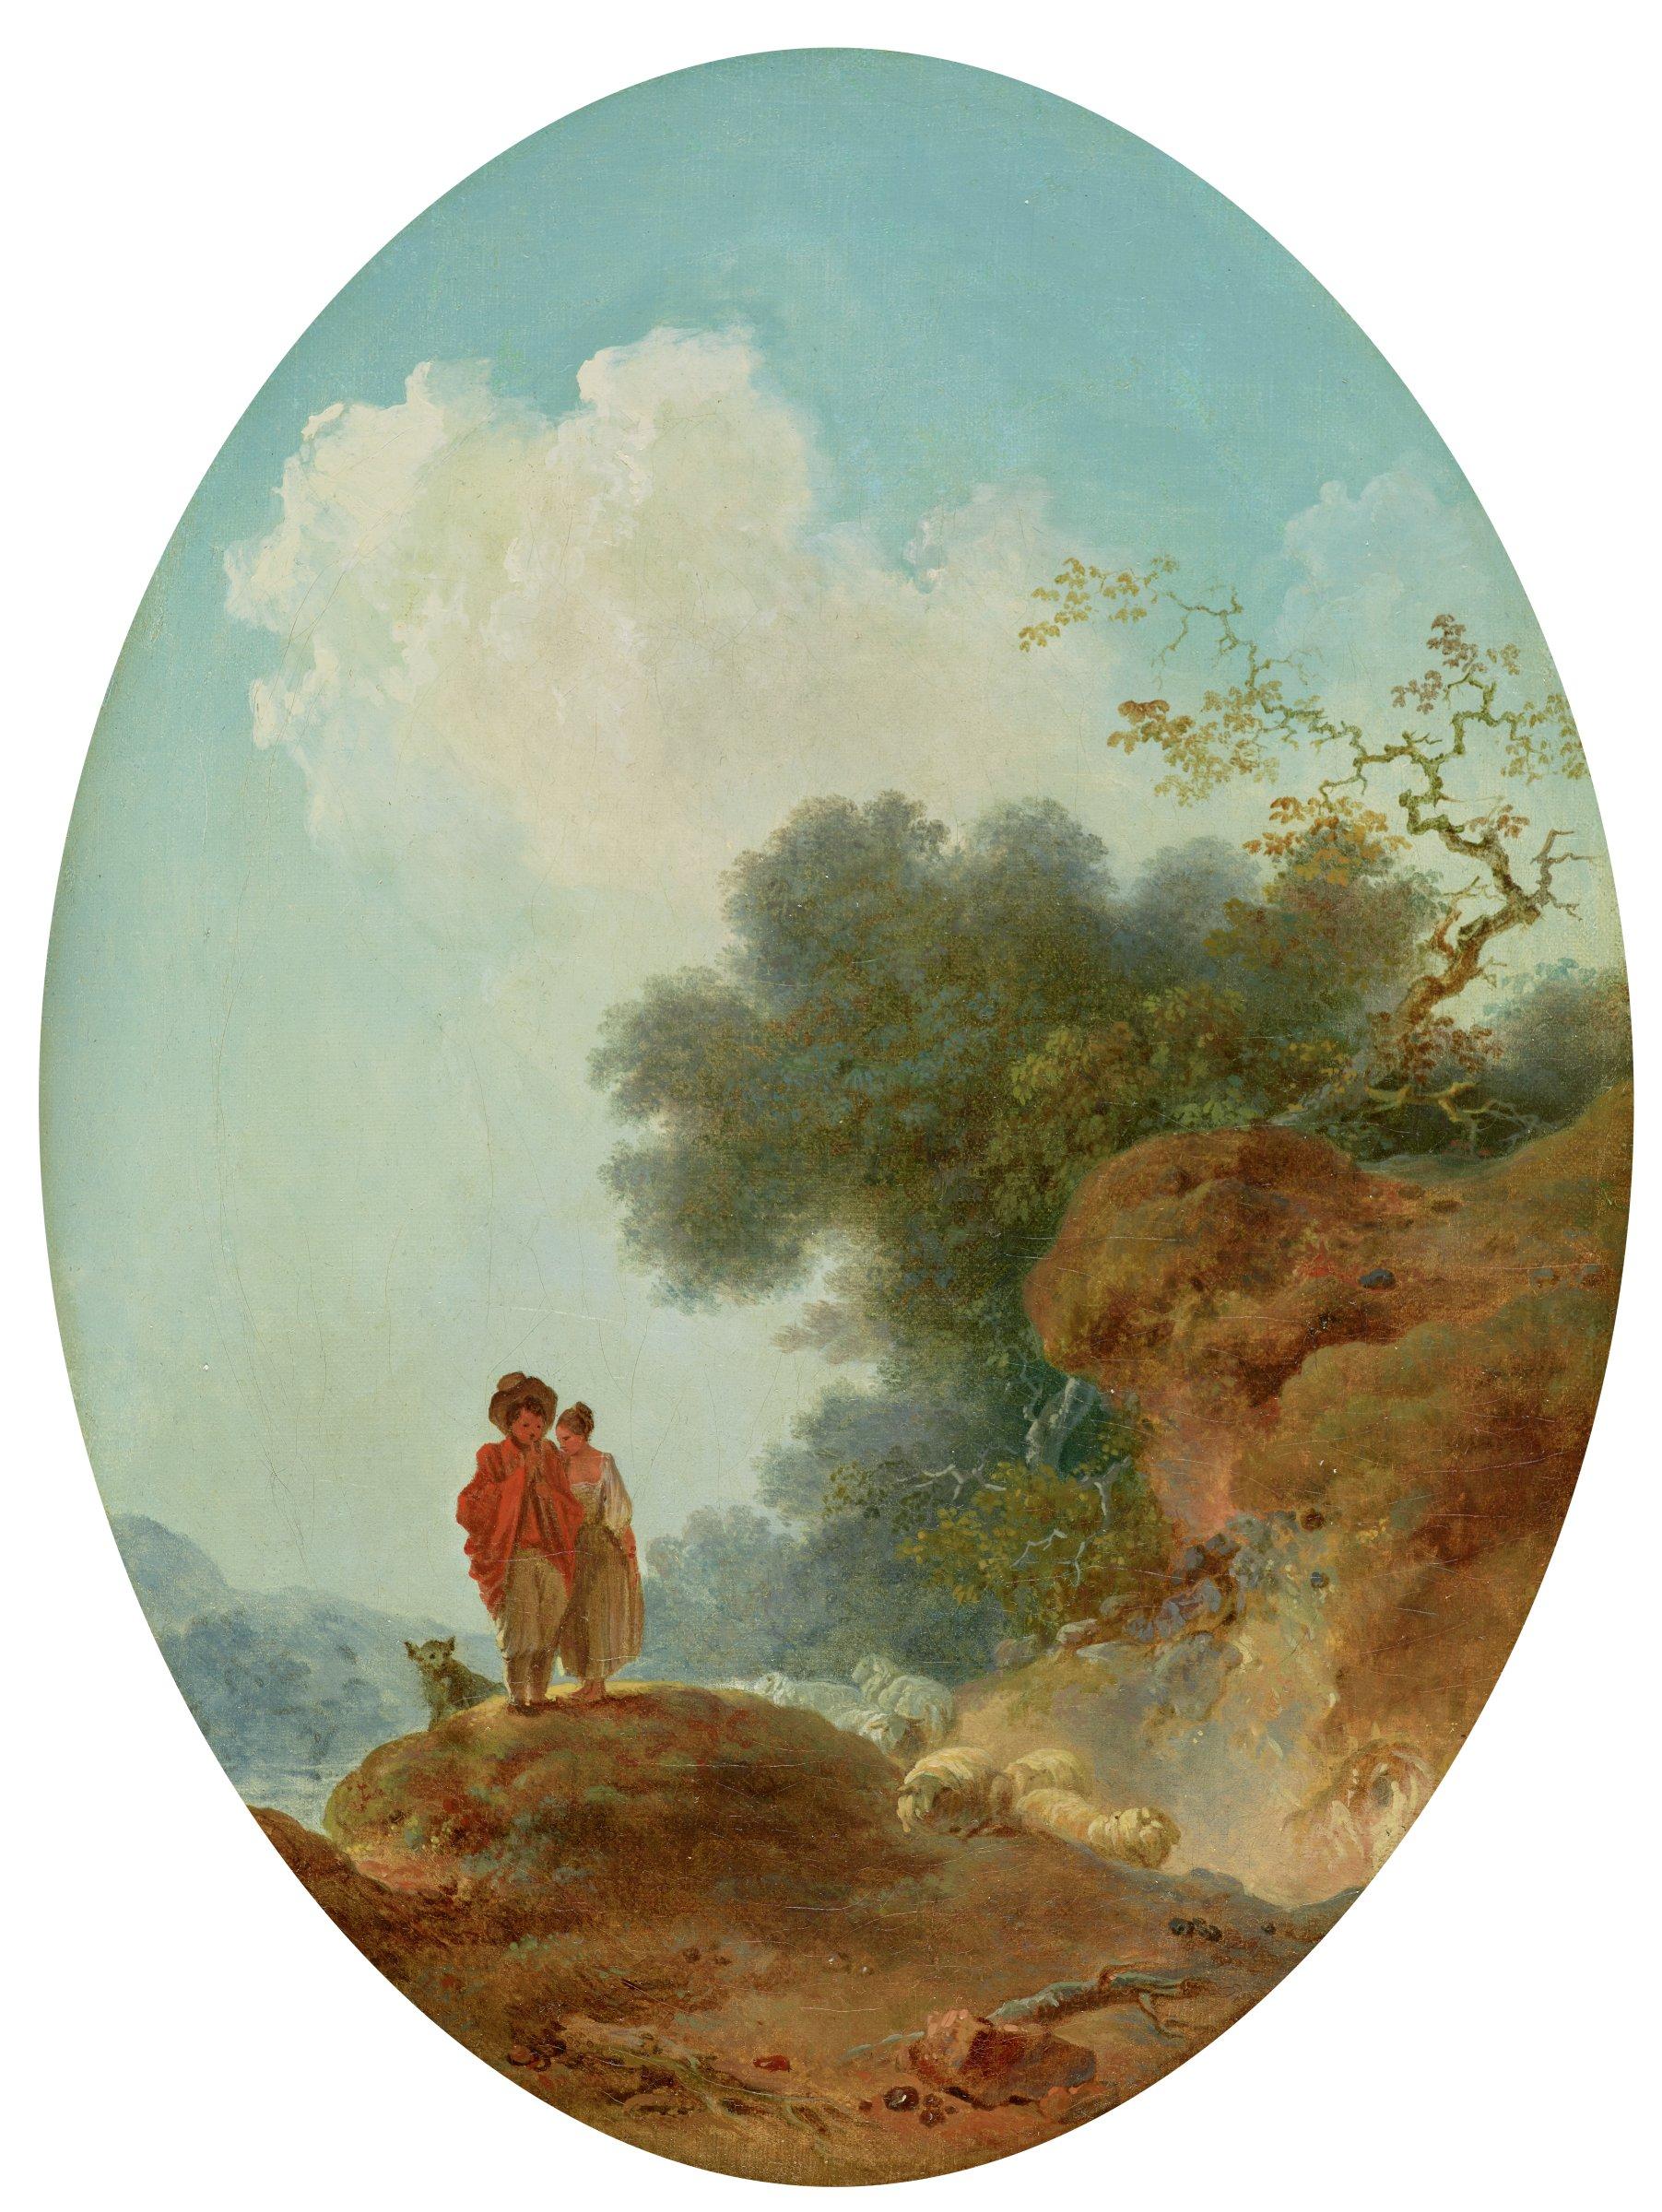 Les Bergers (Shepherds), Jean-Honoré Fragonard, oil on canvas